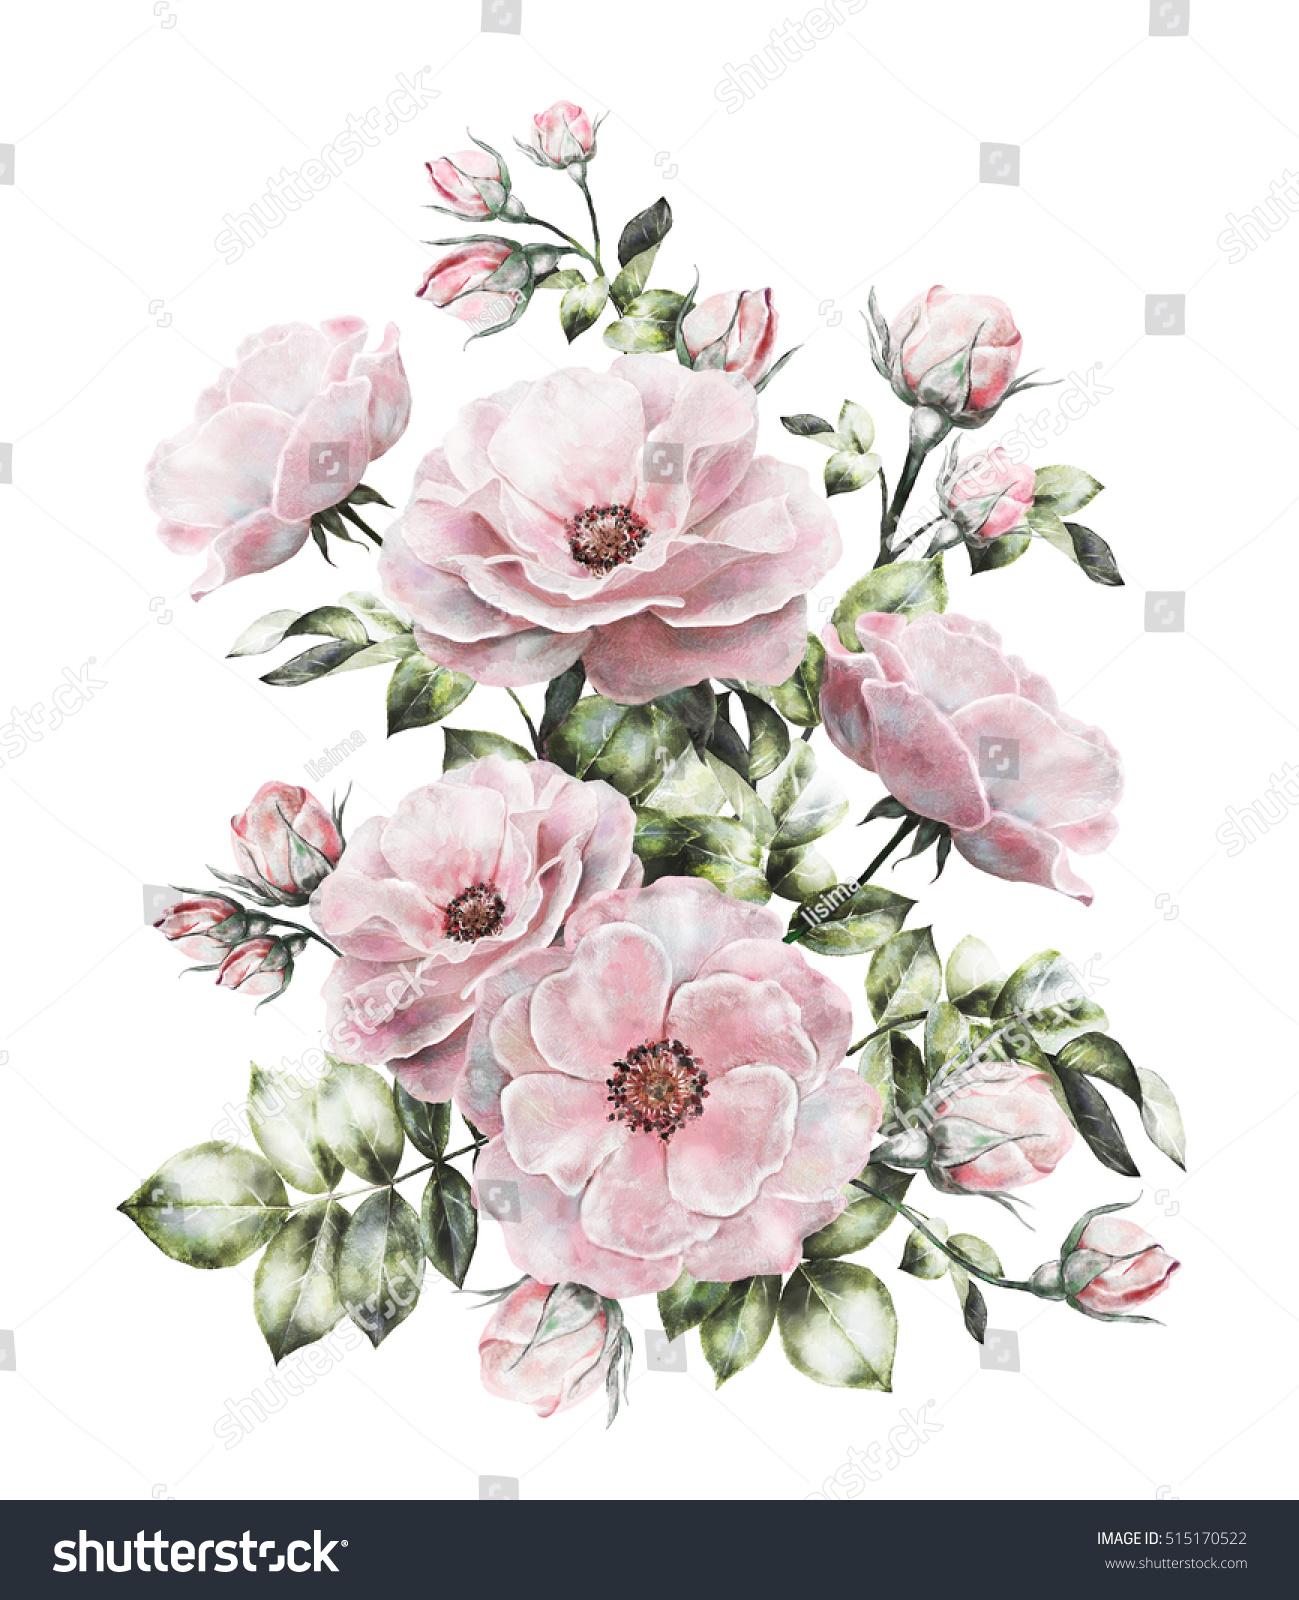 Vintage Watercolor Flowers Floral Illustration Flower Stock